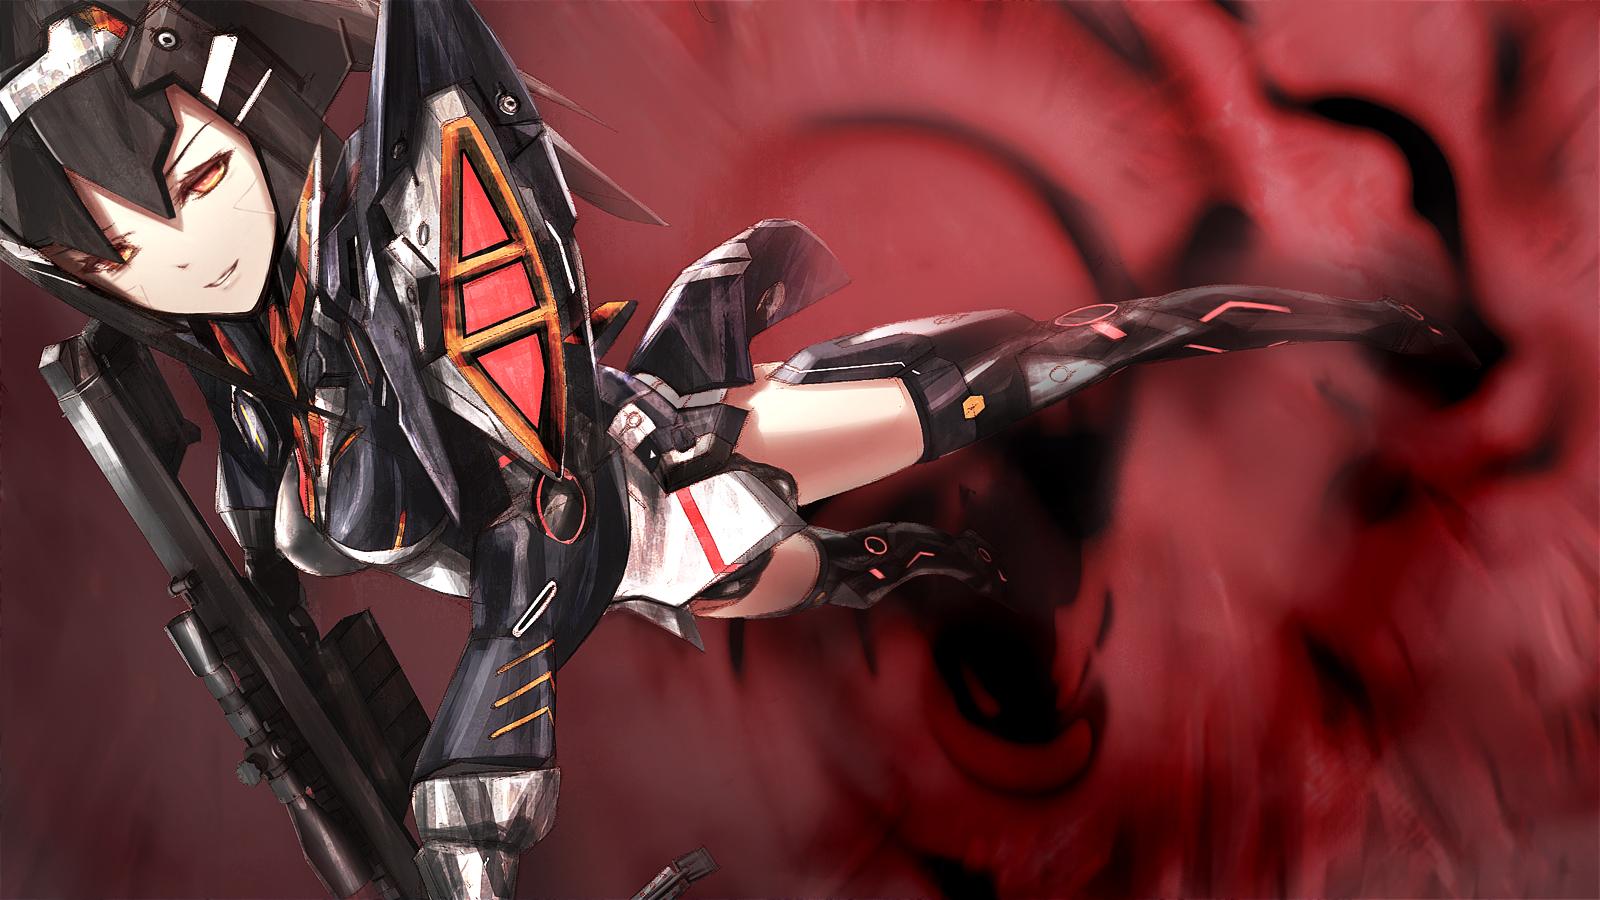 Phantasy Star Online 2 Wallpaper: Black Hair Gun Kawanakajima Lisa (pso2) Phantasy Star Ii